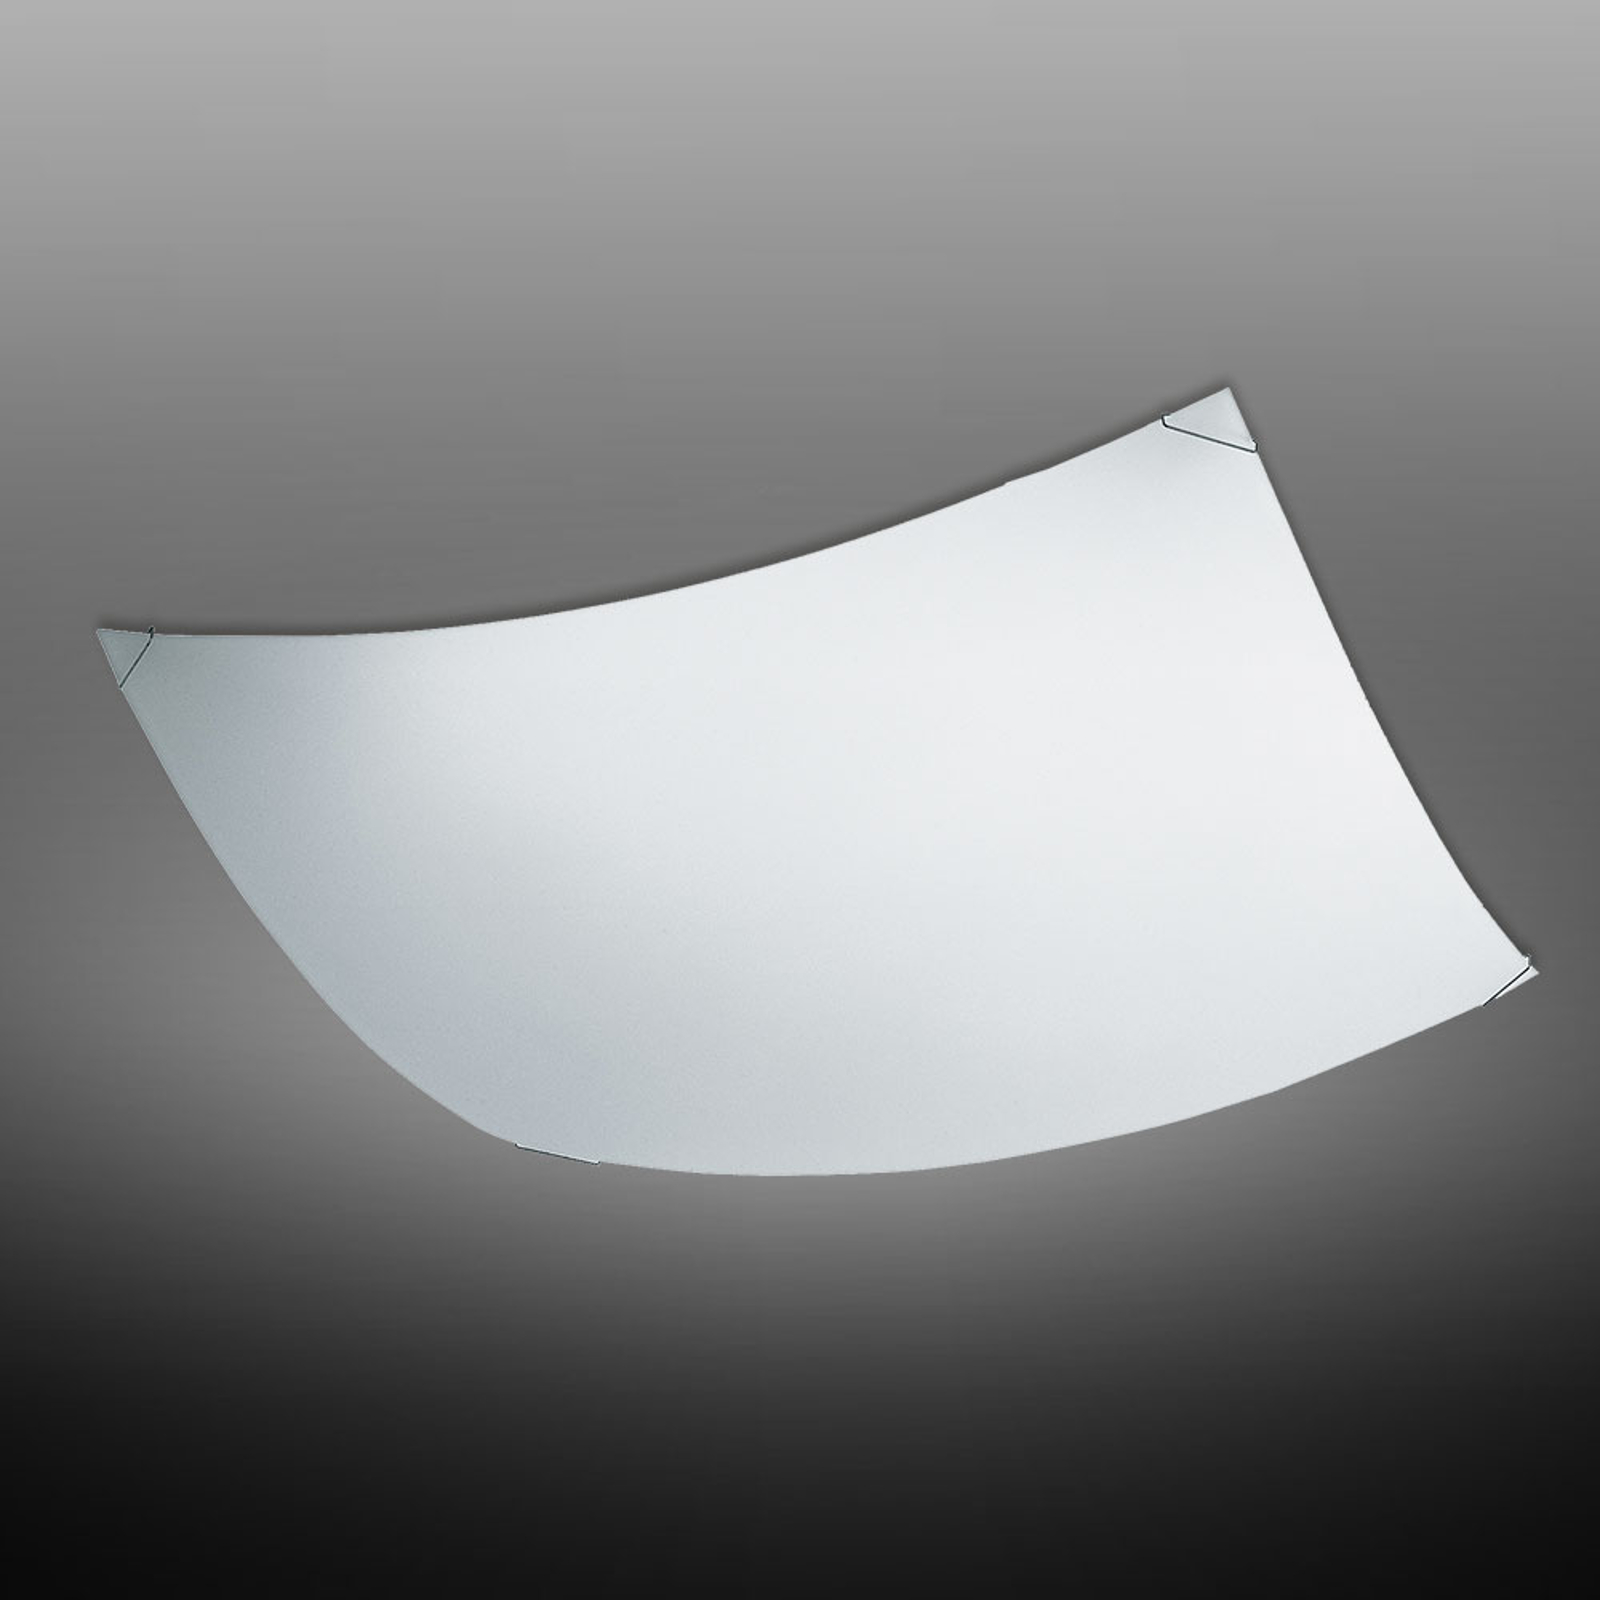 Qadra Ice taklampe, 55 cm